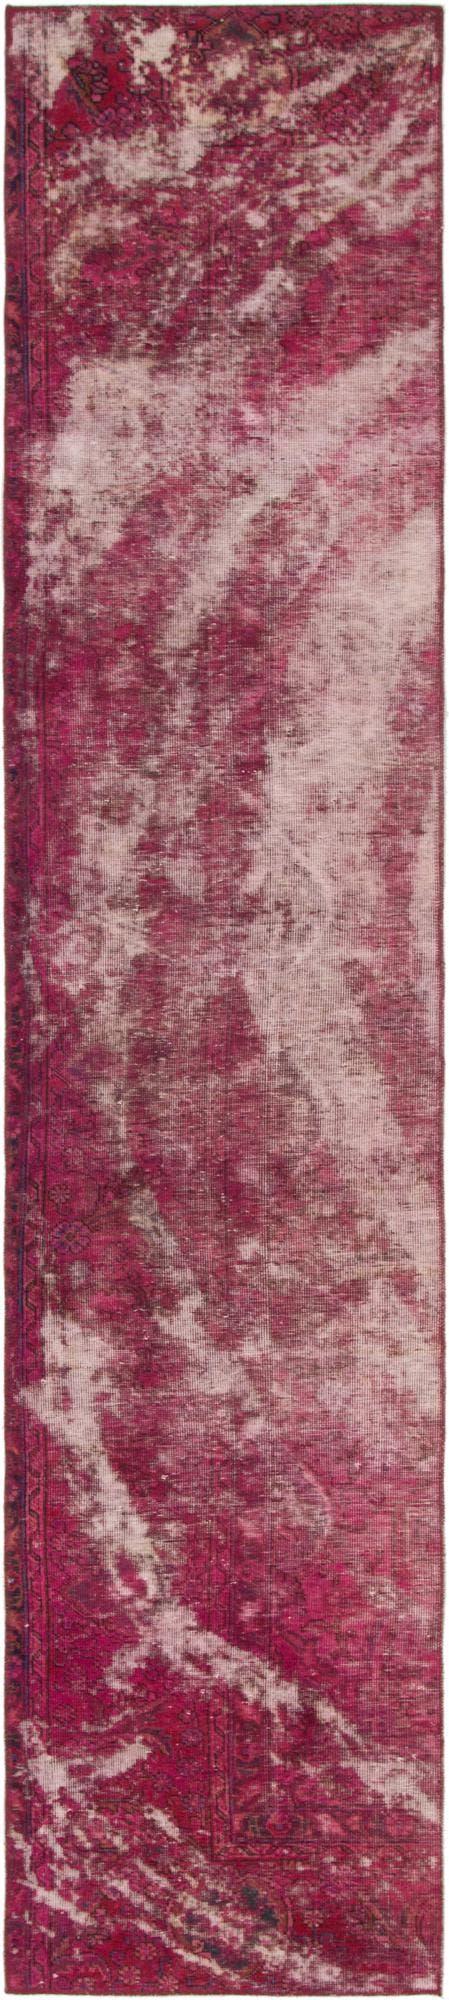 2' 5 x 11' 10 Ultra Vintage Persian Runner Rug main image